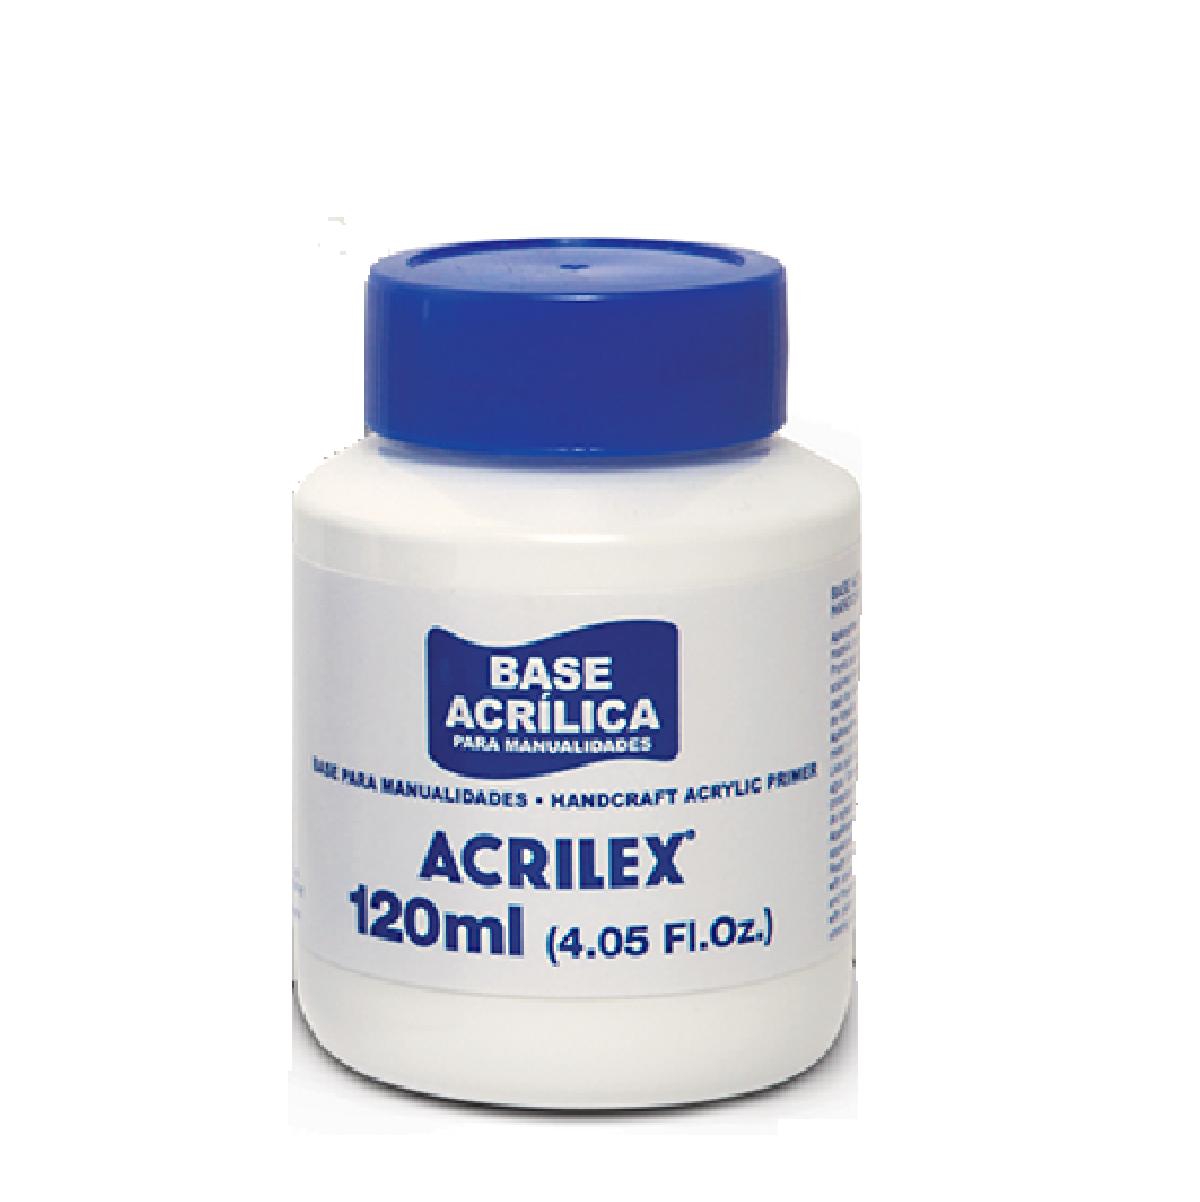 Base Acrílica P/ Artesanato 120ml Acrilex